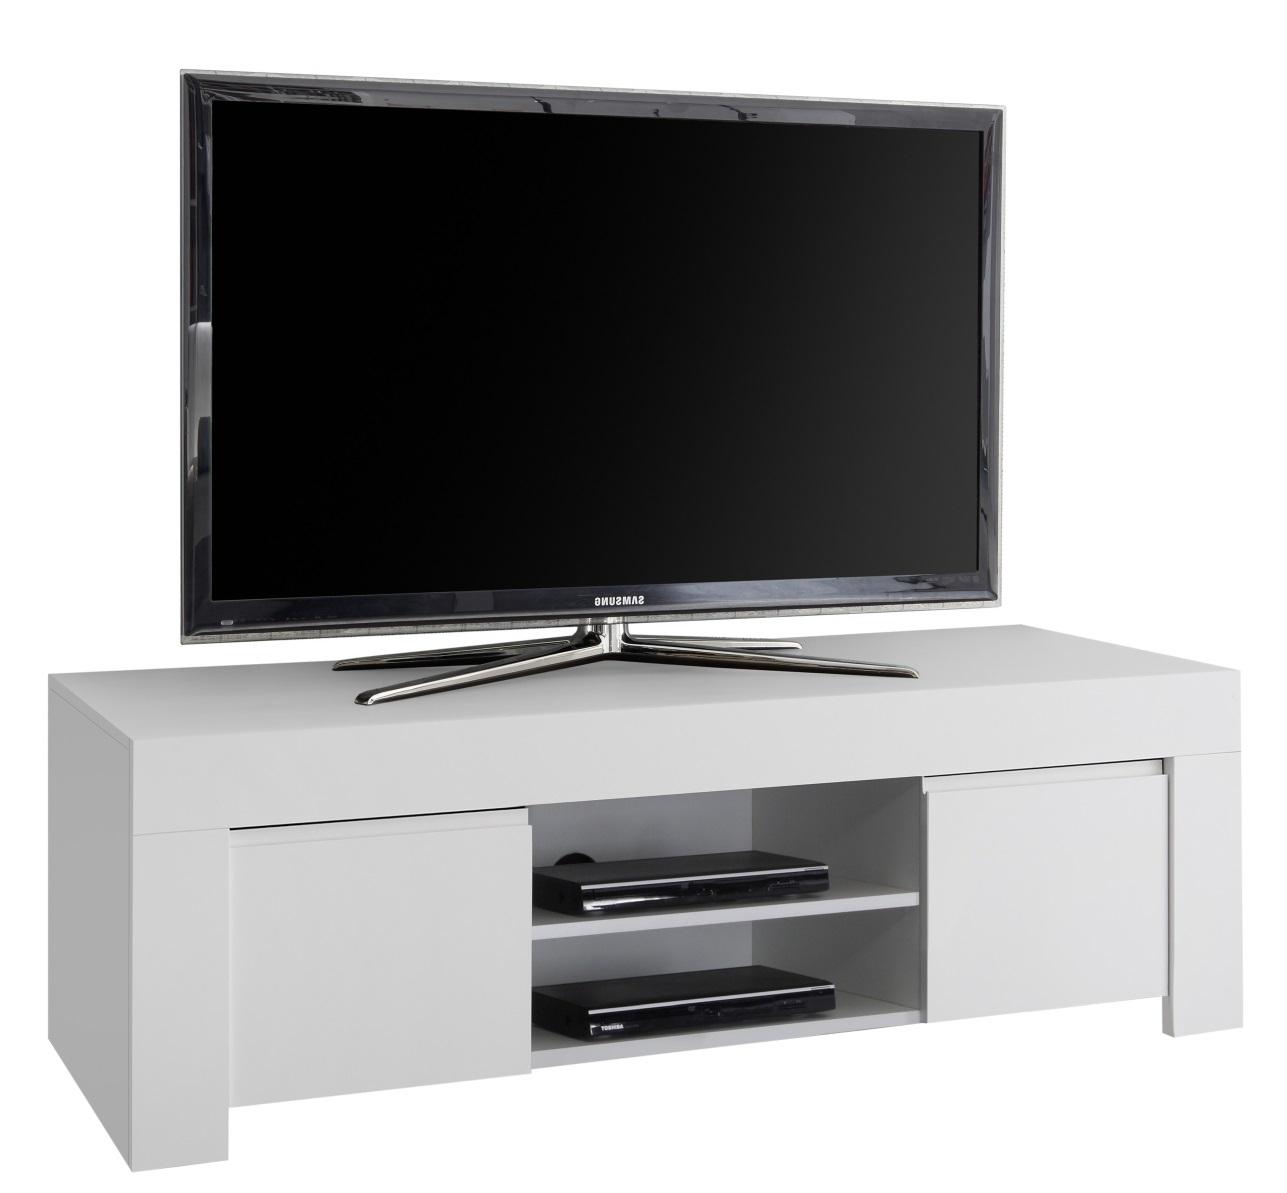 Tv-meubel Firenze 138 cm breed in mat wit | Pesaro Mobilia